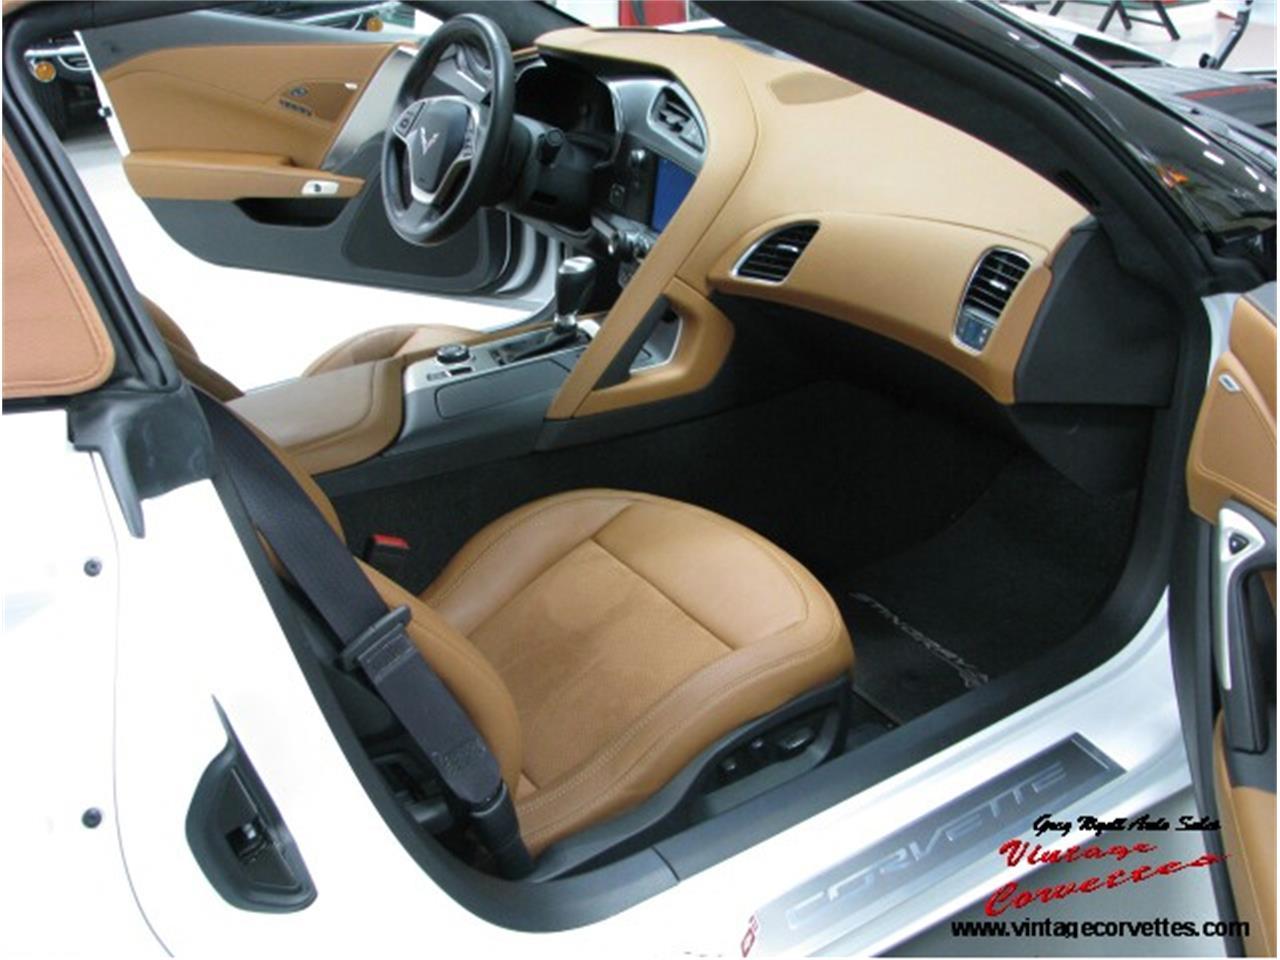 2014 Chevrolet Corvette (CC-1297930) for sale in Summerville, Georgia